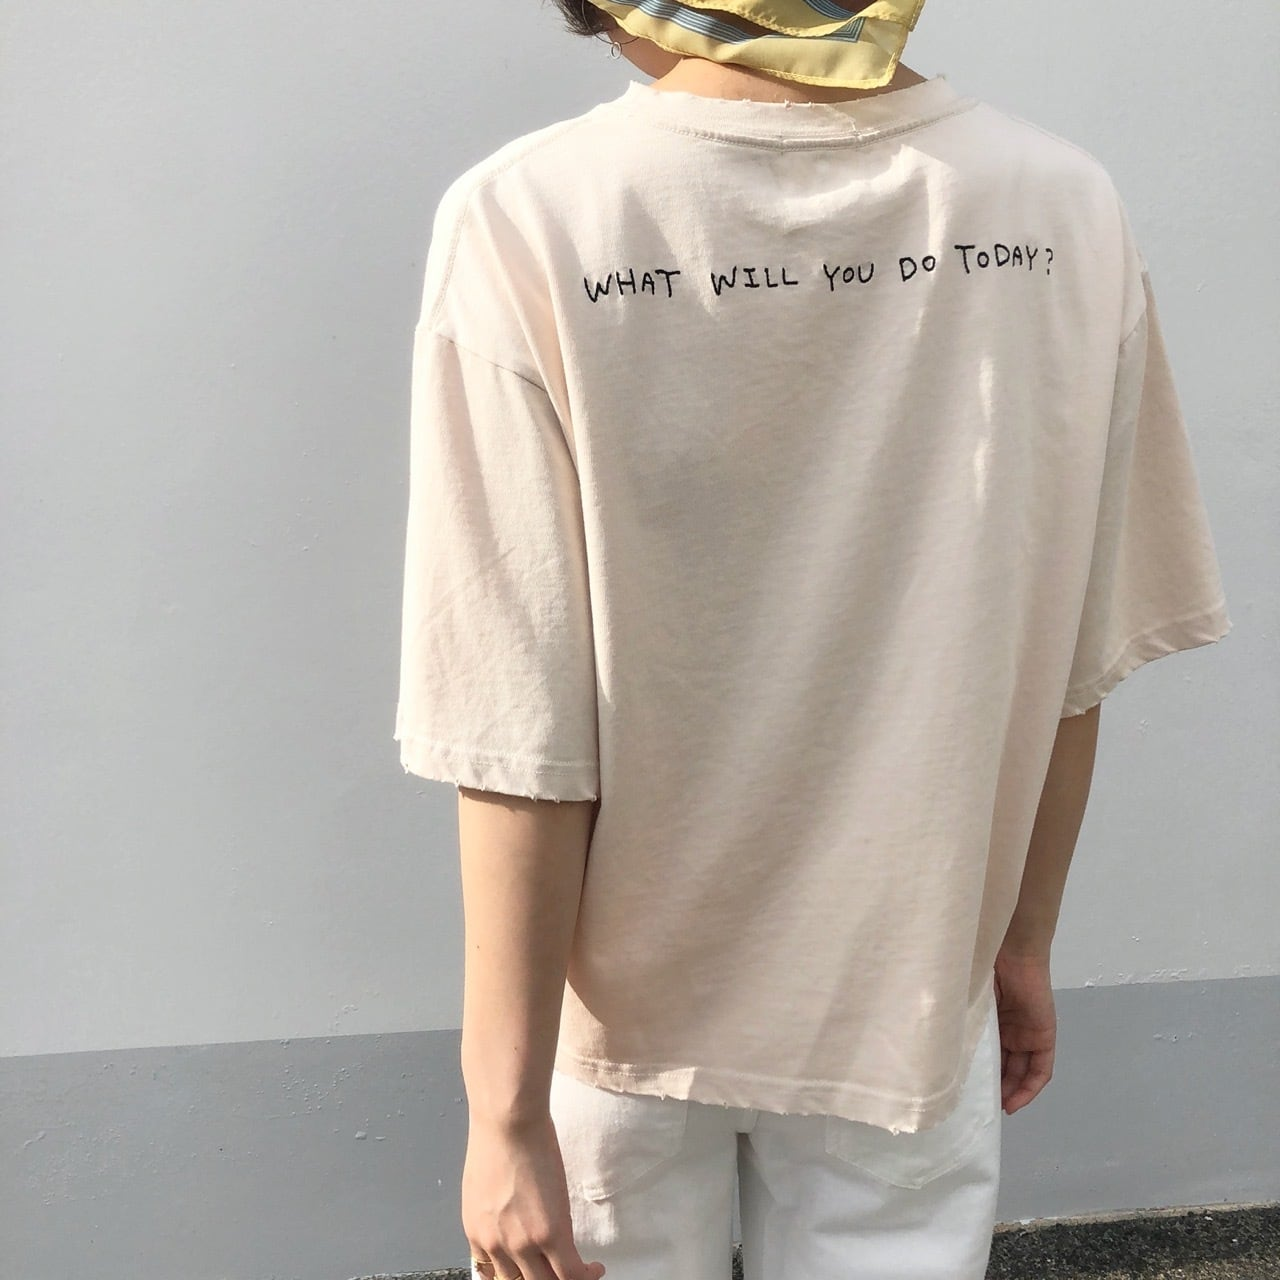 【 CLEIO 】- 948-13629 - ダメージ刺繍ポケットT